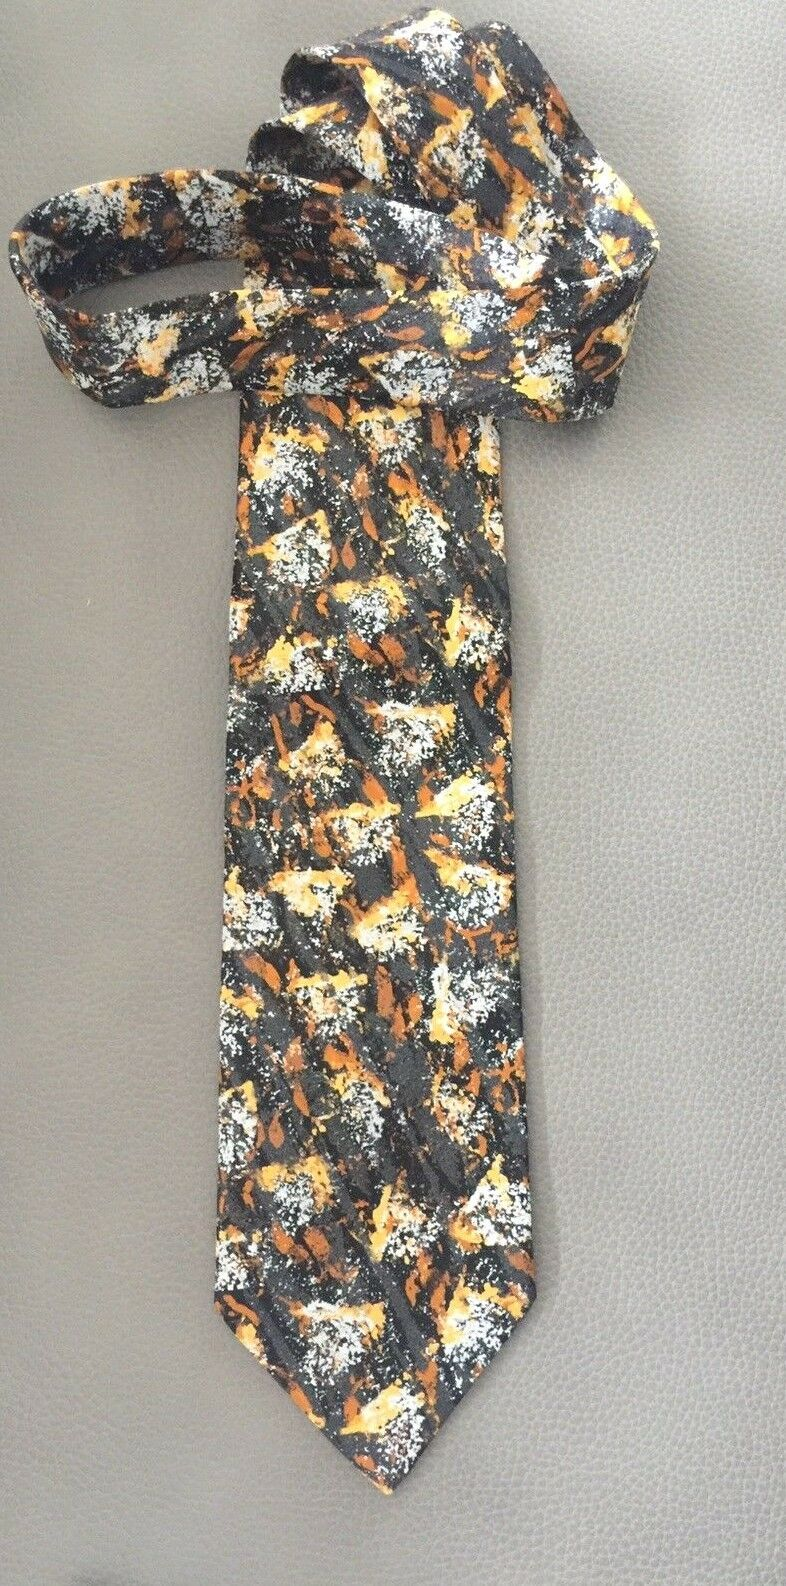 ITALO FERRETTI Brand New Set Hand Made Tie & Handkerchief Silk Boxed Good Gift !